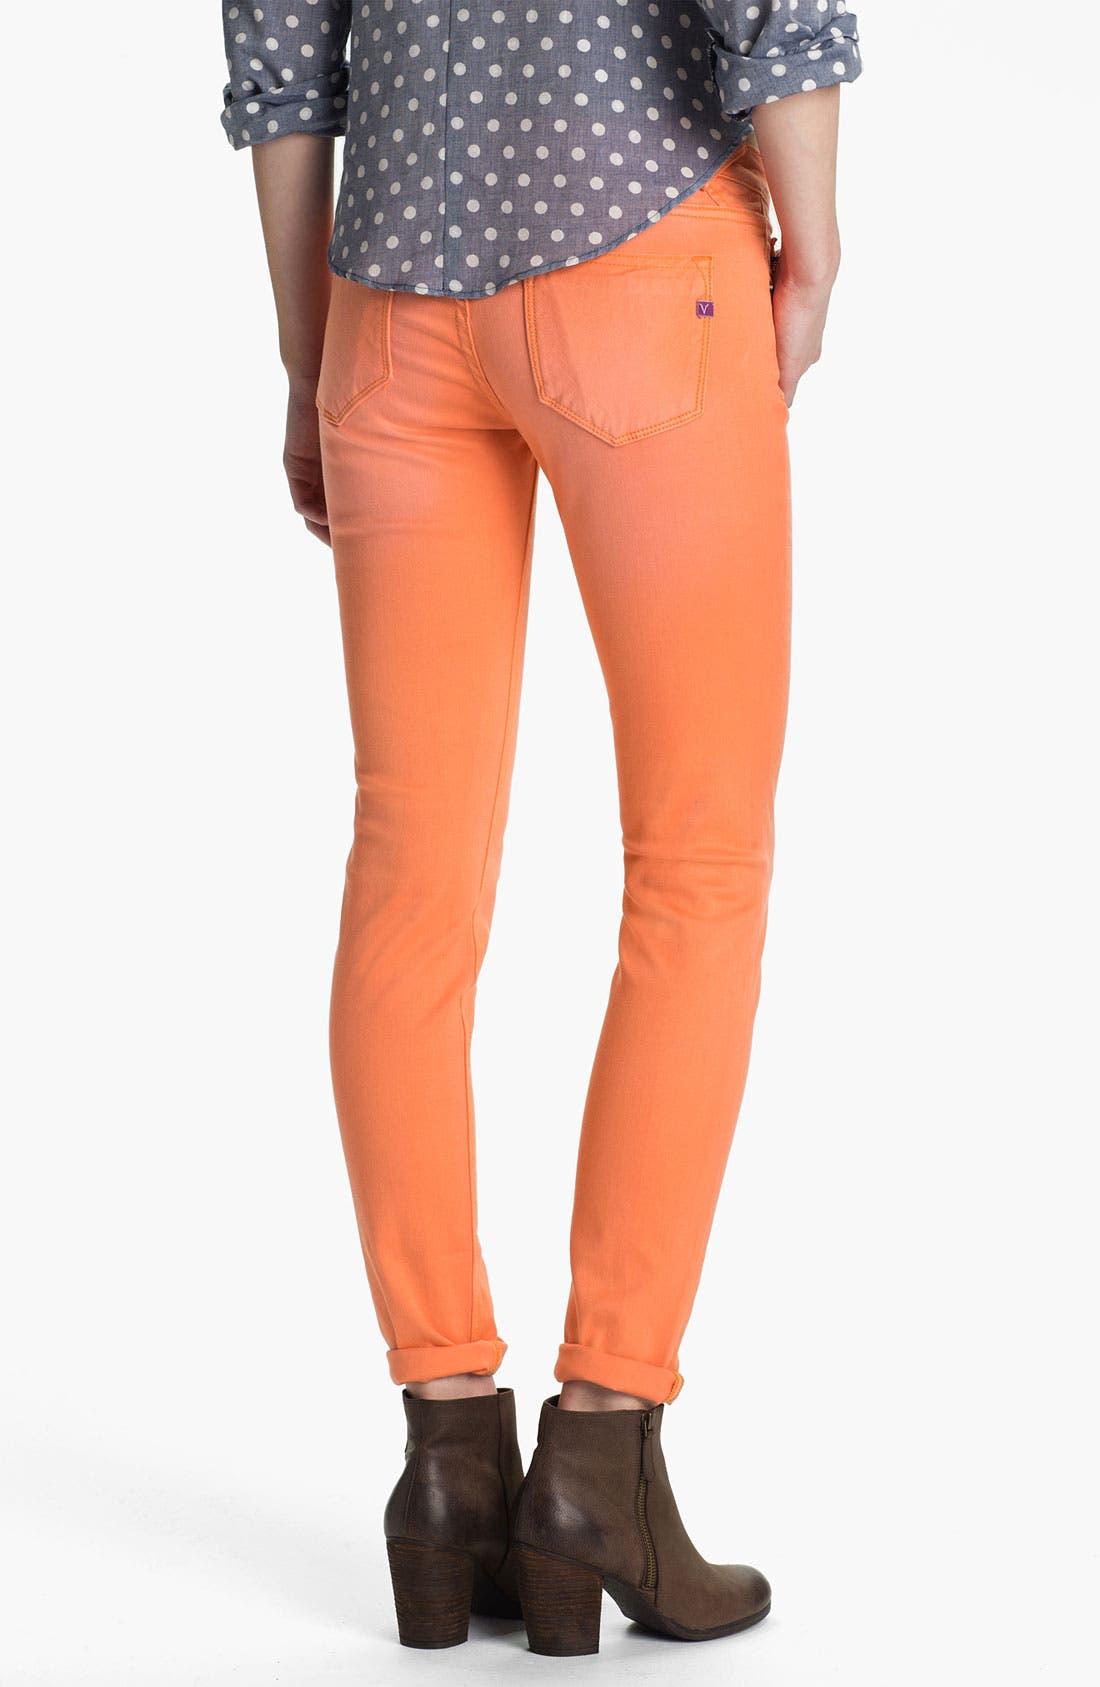 Alternate Image 1 Selected - Vigoss Skinny Jeans (Tangerine) (Juniors)